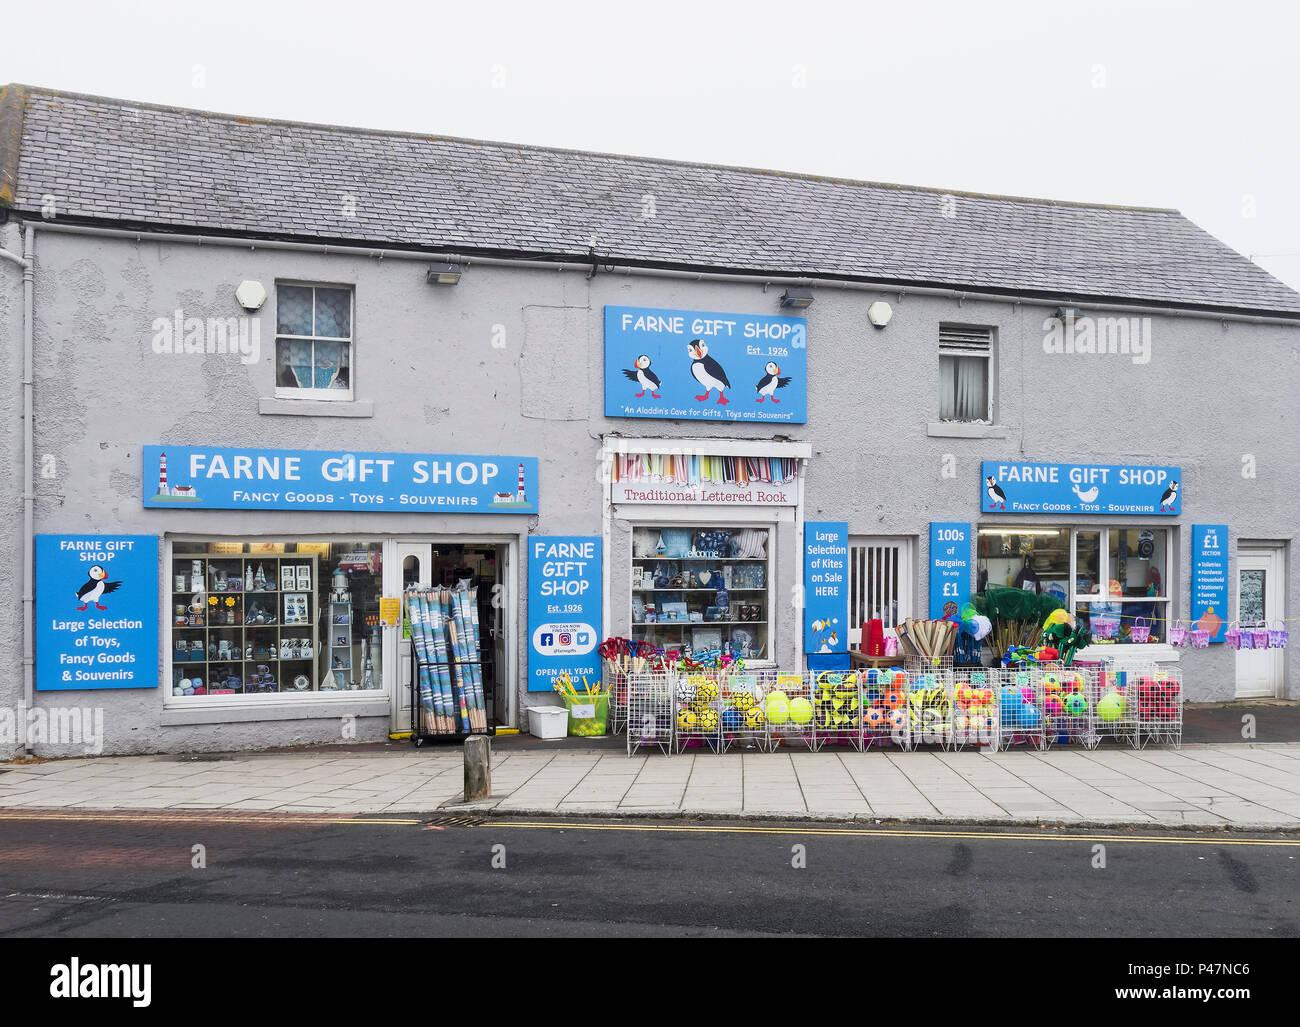 Traditional seaside gift shop at Seahouses, Northumberland, UK - Stock Image